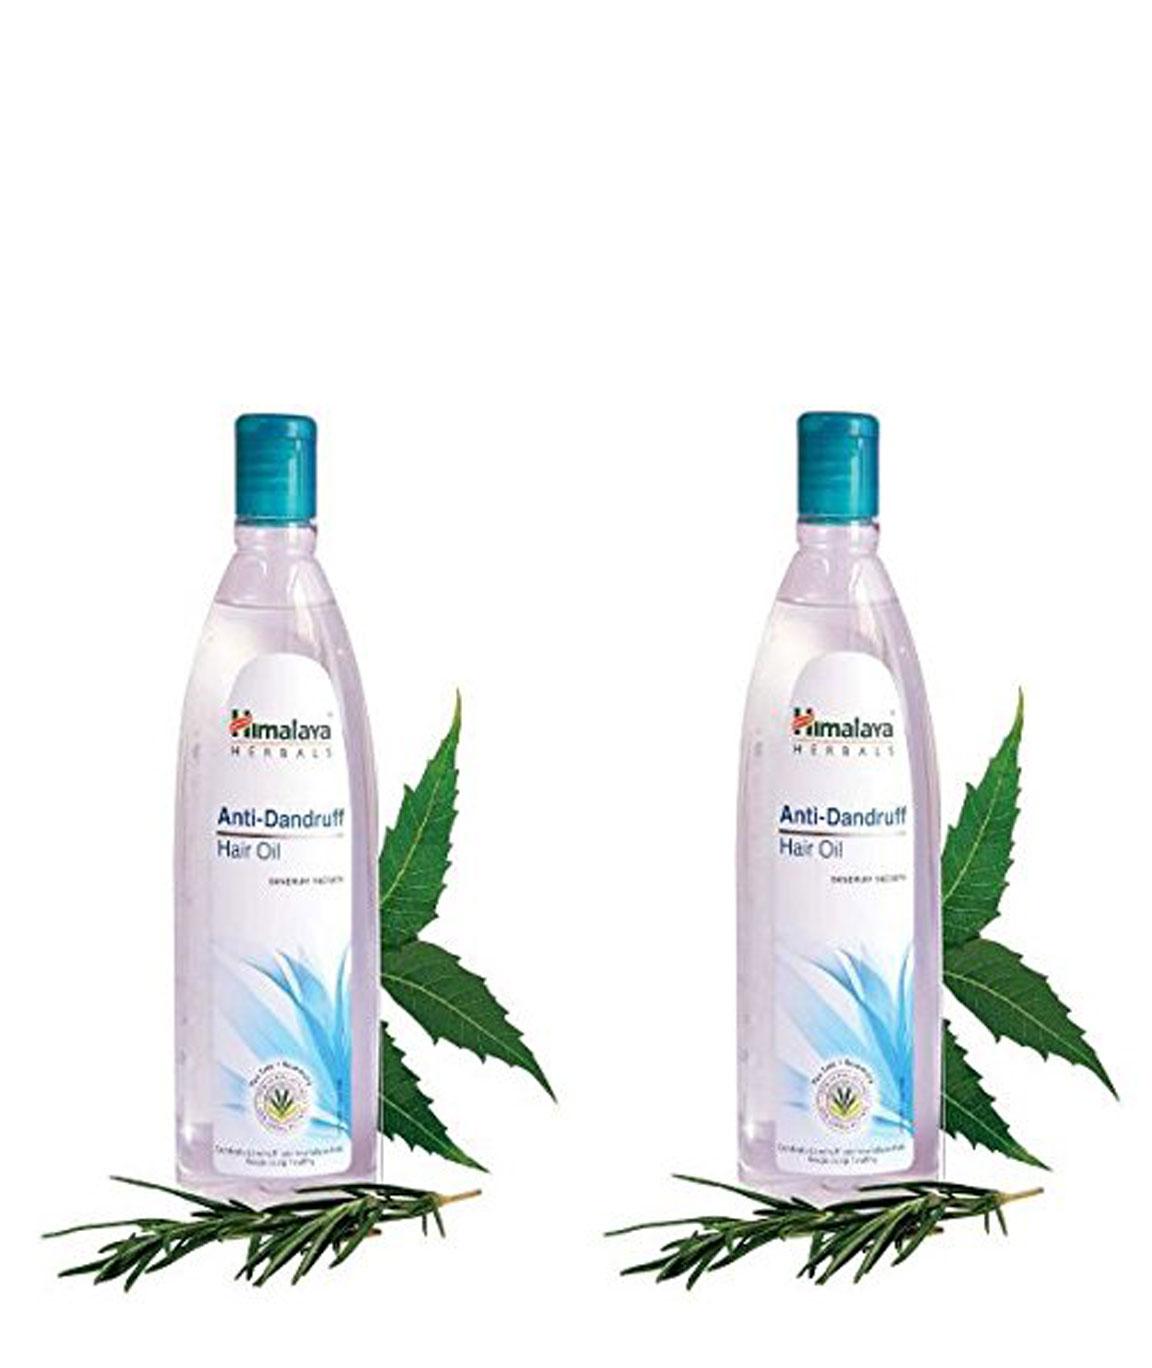 Himalaya Anti-Dandruff Hair Oil - 100ml (Pack of 2)